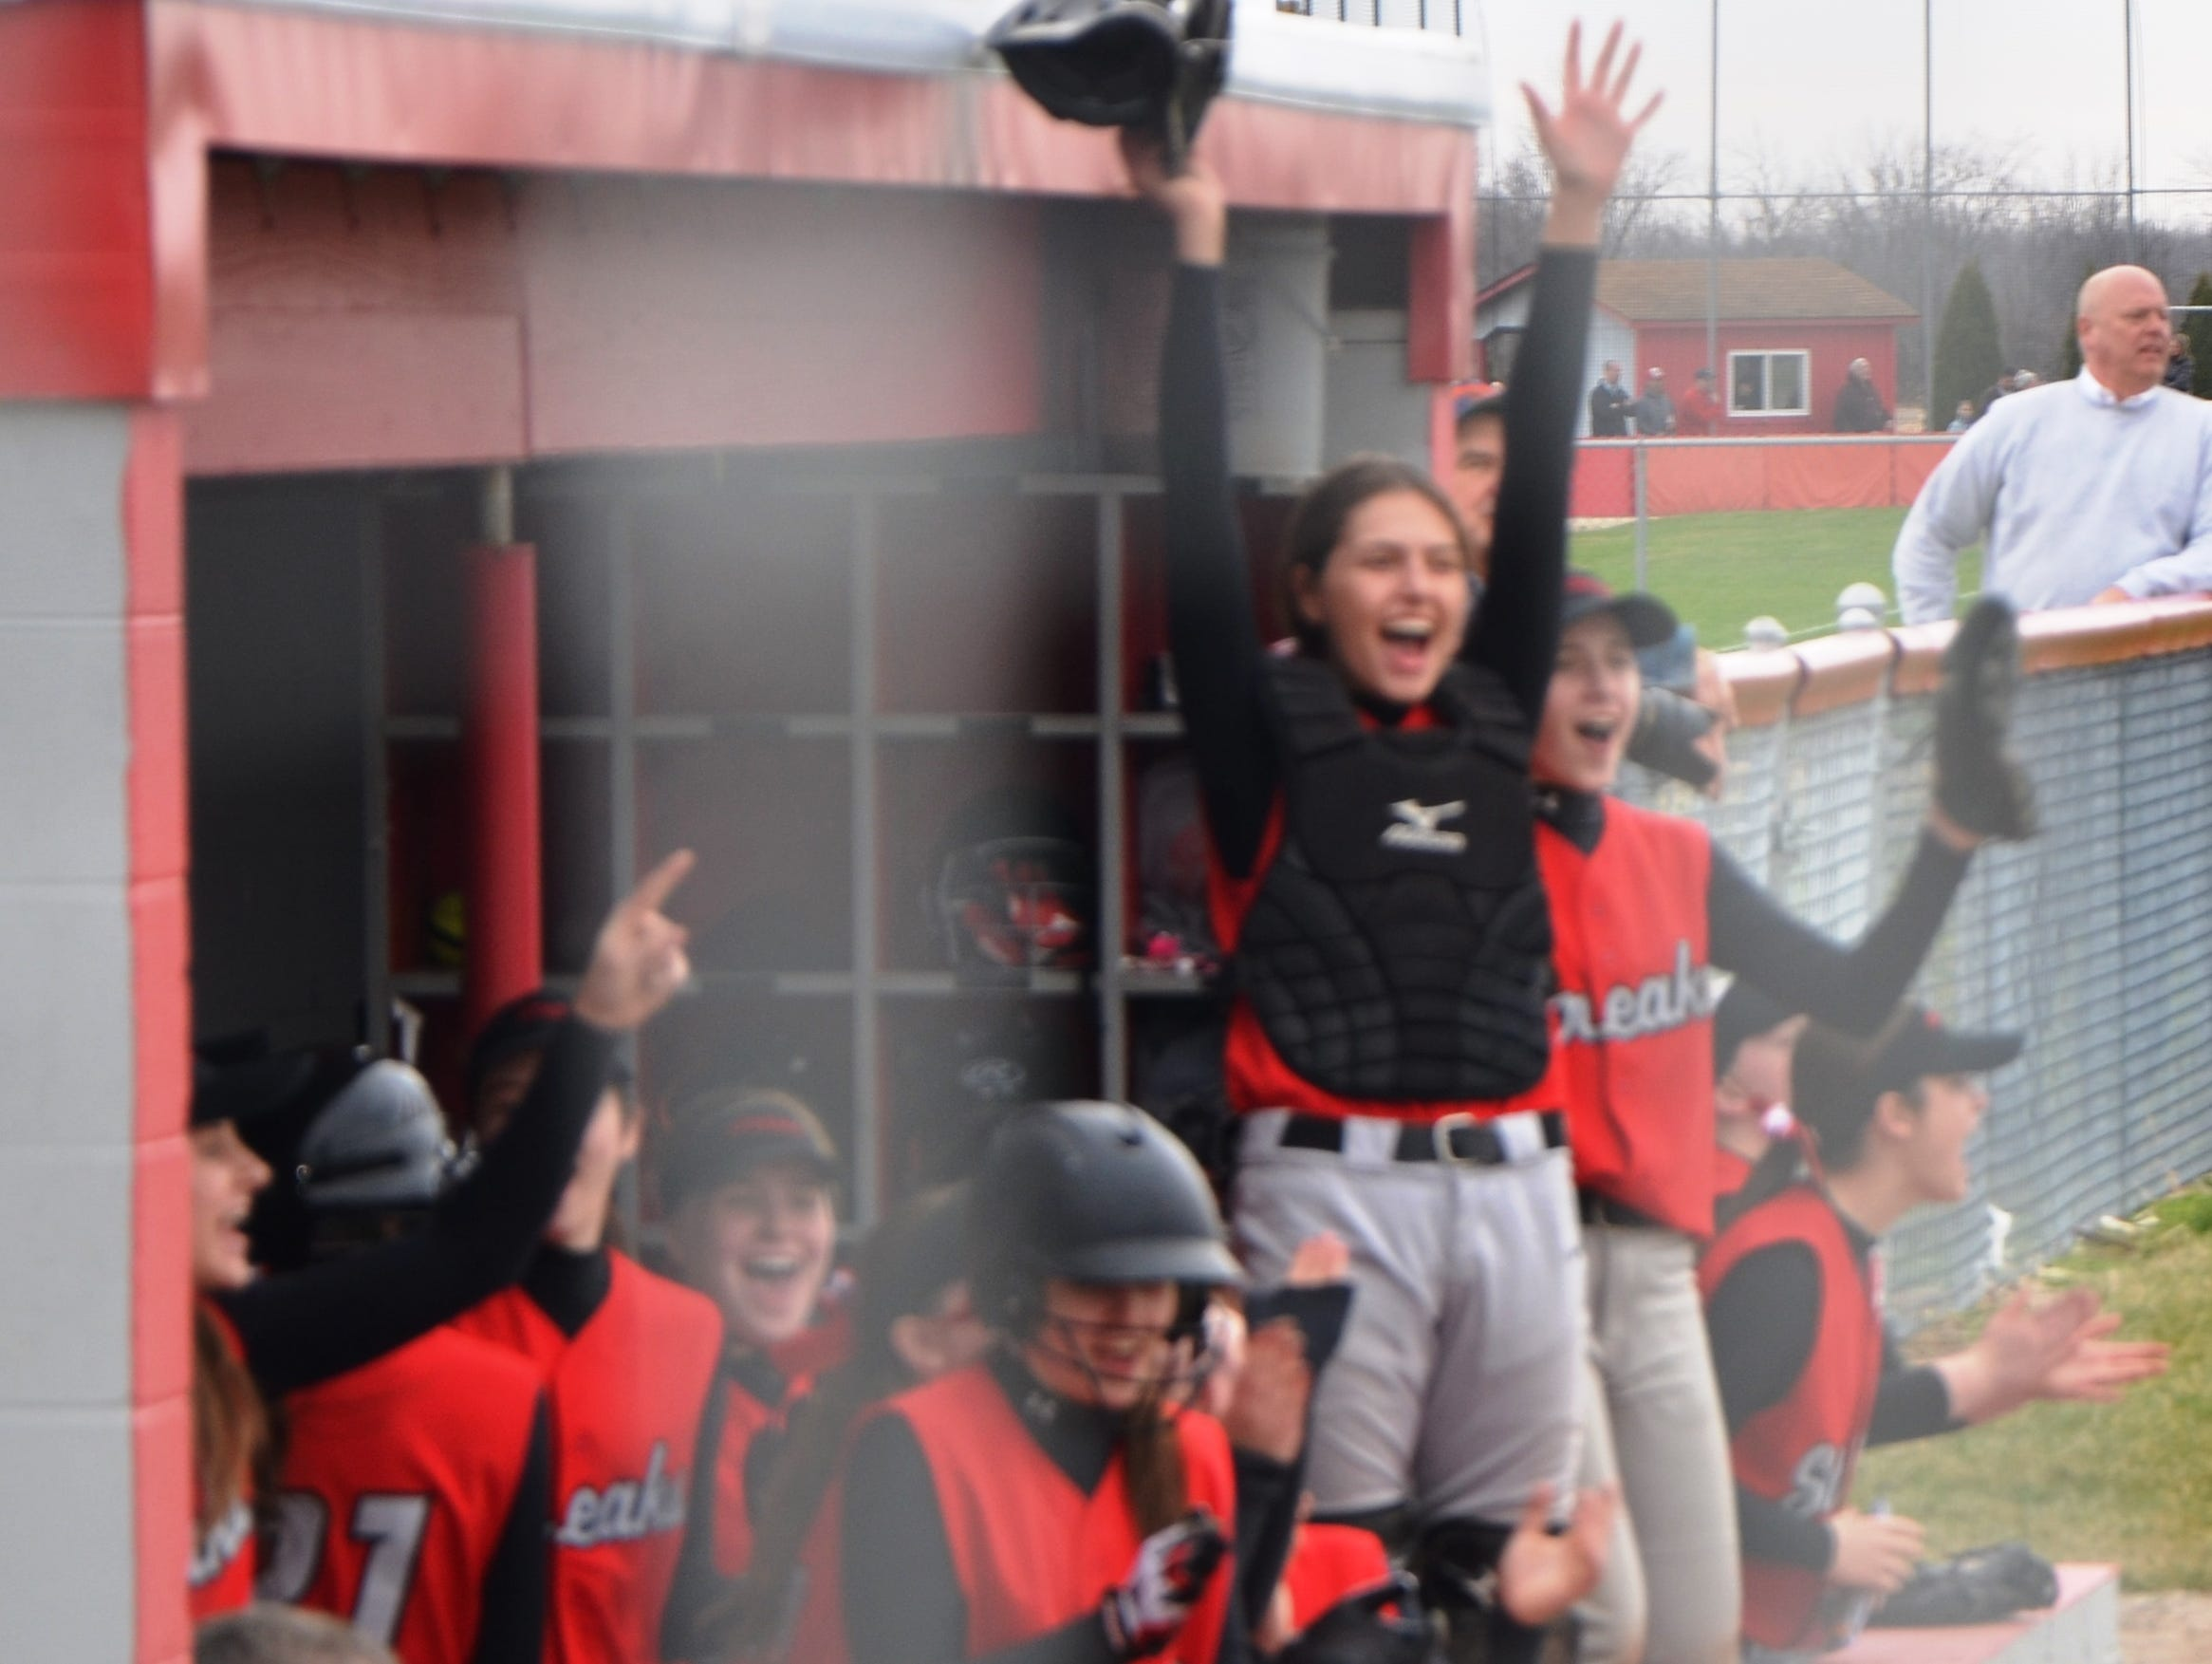 The St. Joseph Central softball team celebrates from its dugout as a run scores for the Crimson Streaks against Clyde High School. SJCC won the game 4-2. Rich McGowan/News-Messenger